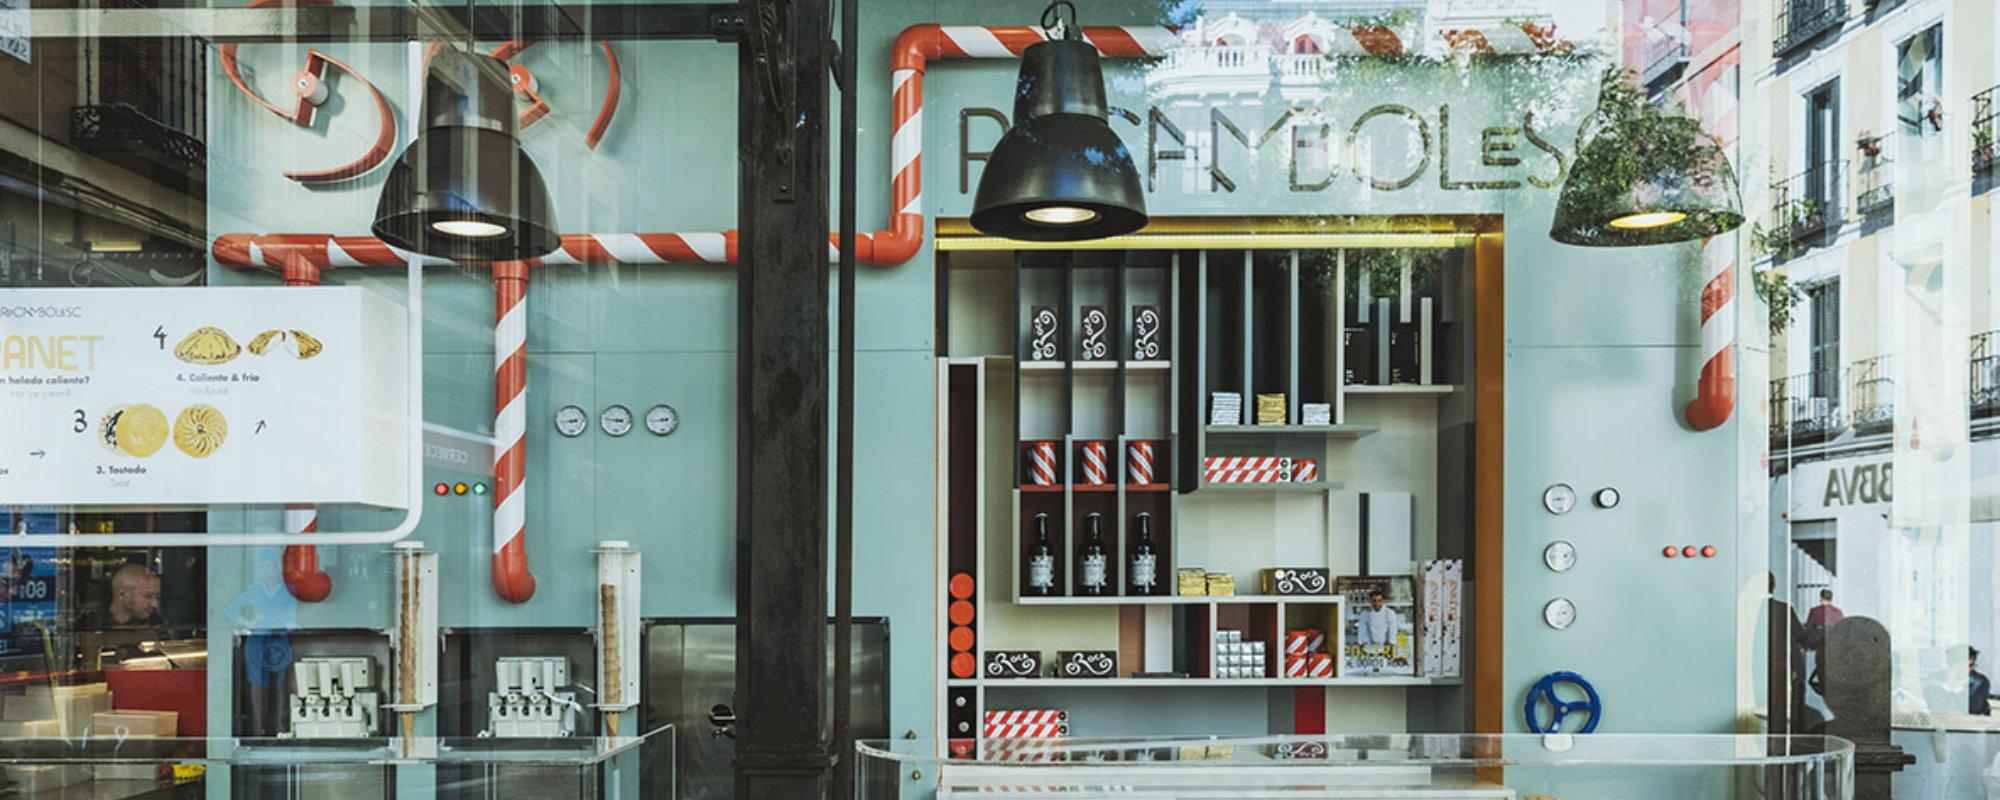 Proyectos lujuosos: Tarruella Trenchs Interiorismo en Barcelona proyectos lujuosos Proyectos lujuosos: Tarruella Trenchs Interiorismo en Barcelona Featured1 1